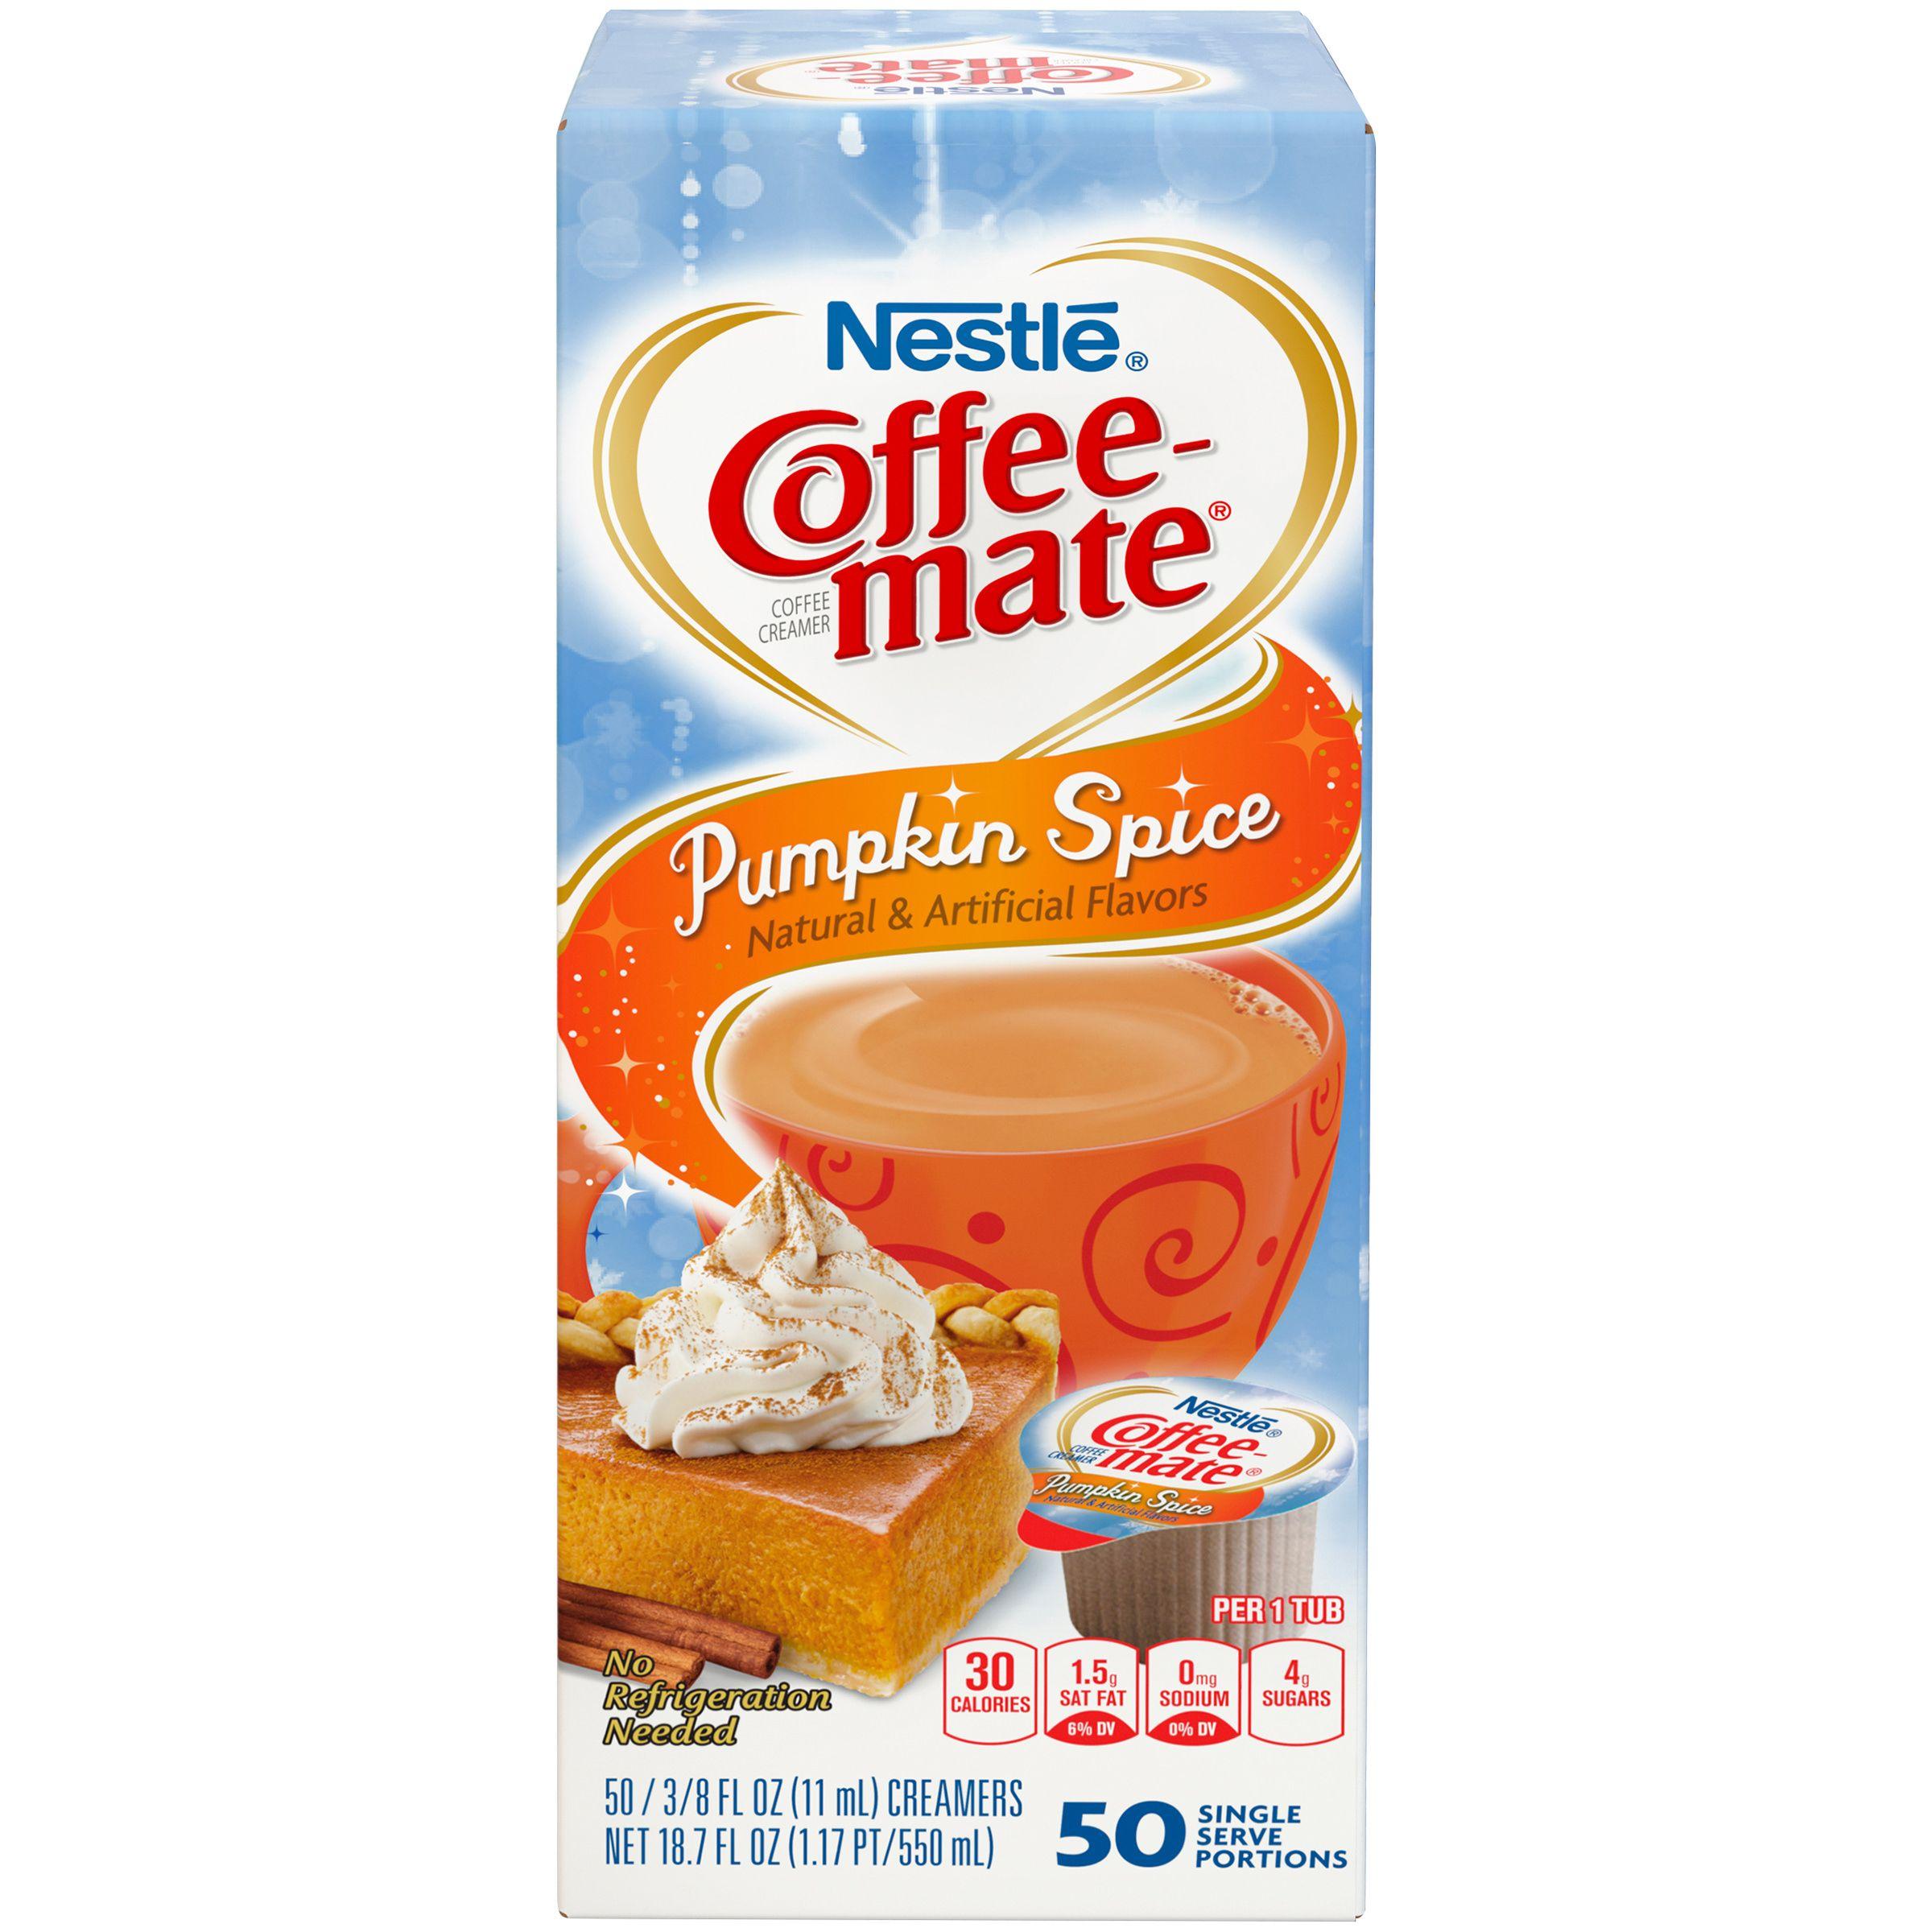 Food Coffee creamer, Pumpkin spice coffee, Pumpkin spice